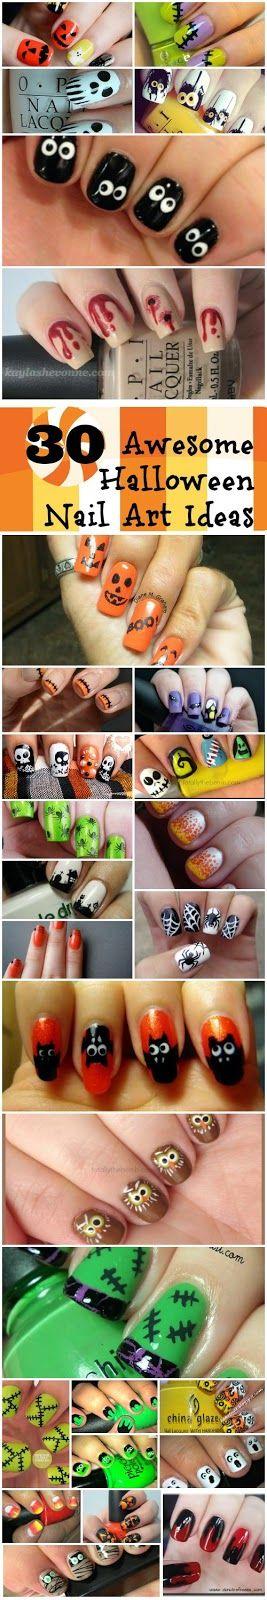 Fashion Pics Blog: 30 Awesome Halloween Nail Art Ideas ...